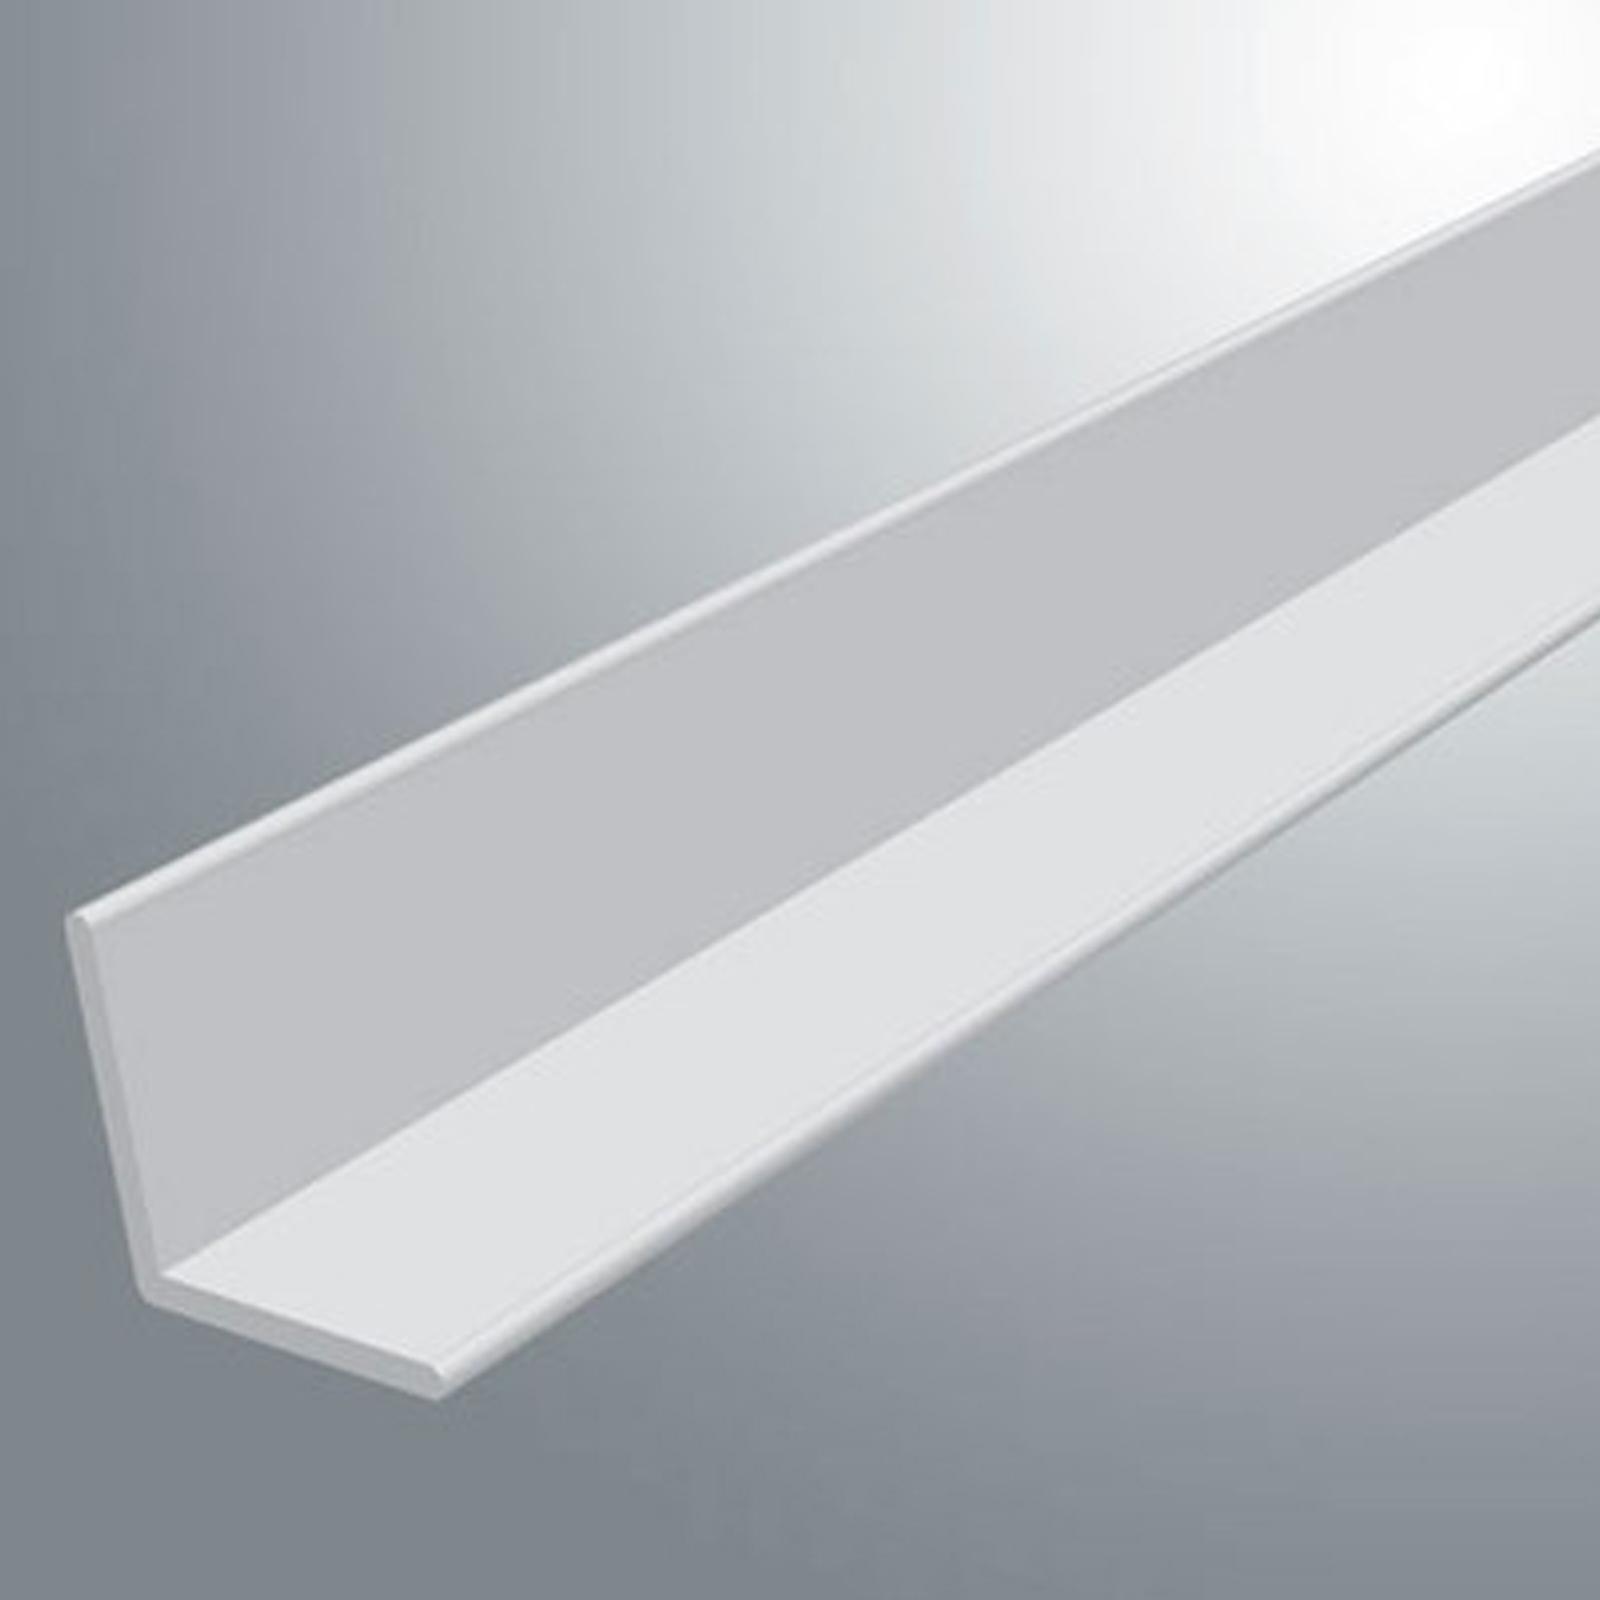 White Plastic Pvc Corner 90 Degree Angle Trim 2 44 Meters